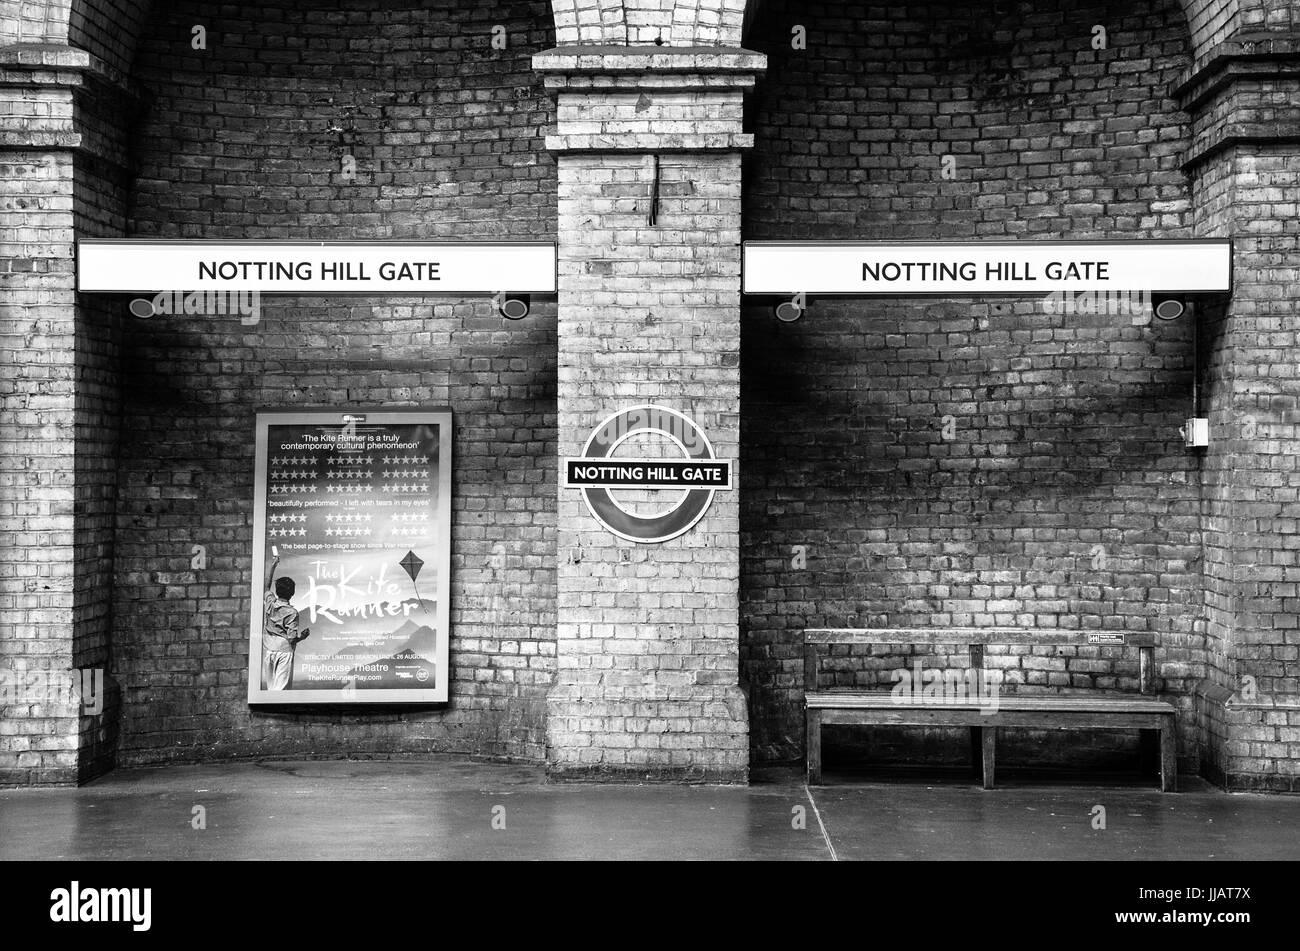 An empty platform at Notting Hill gate London Underground station. - Stock Image